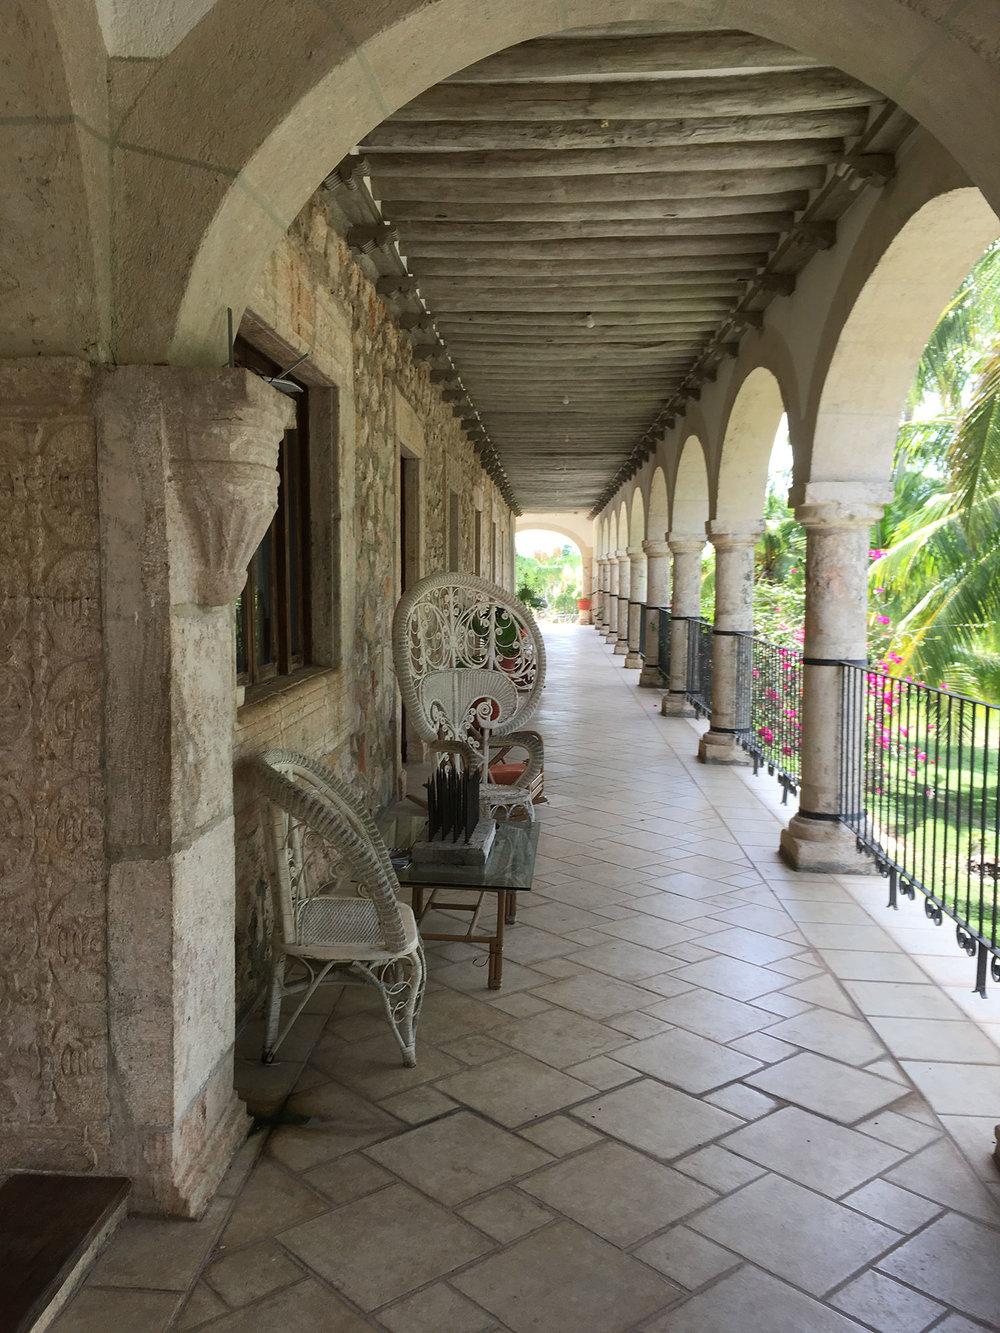 Hammocks_and_Ruins_Blog_Riviera_Maya_Mexico_Travel_Discover_Yucatan_What_to_do_Merida_Haciendas_Tepich_8.jpg